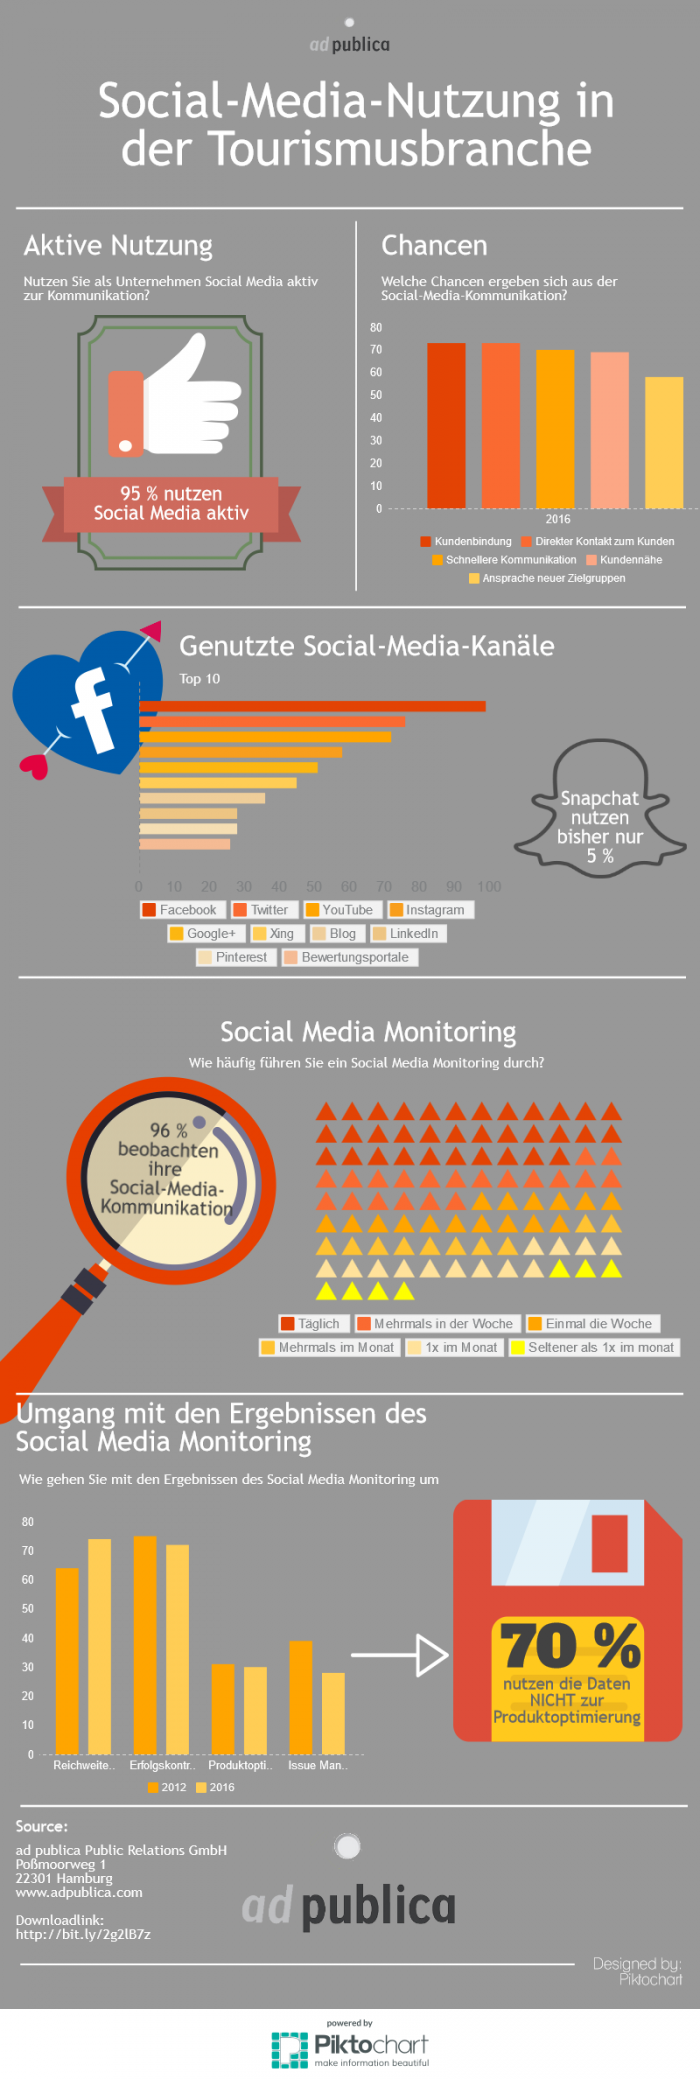 social-media-verhalten-in-der-tourismusbranche-infografik-2016